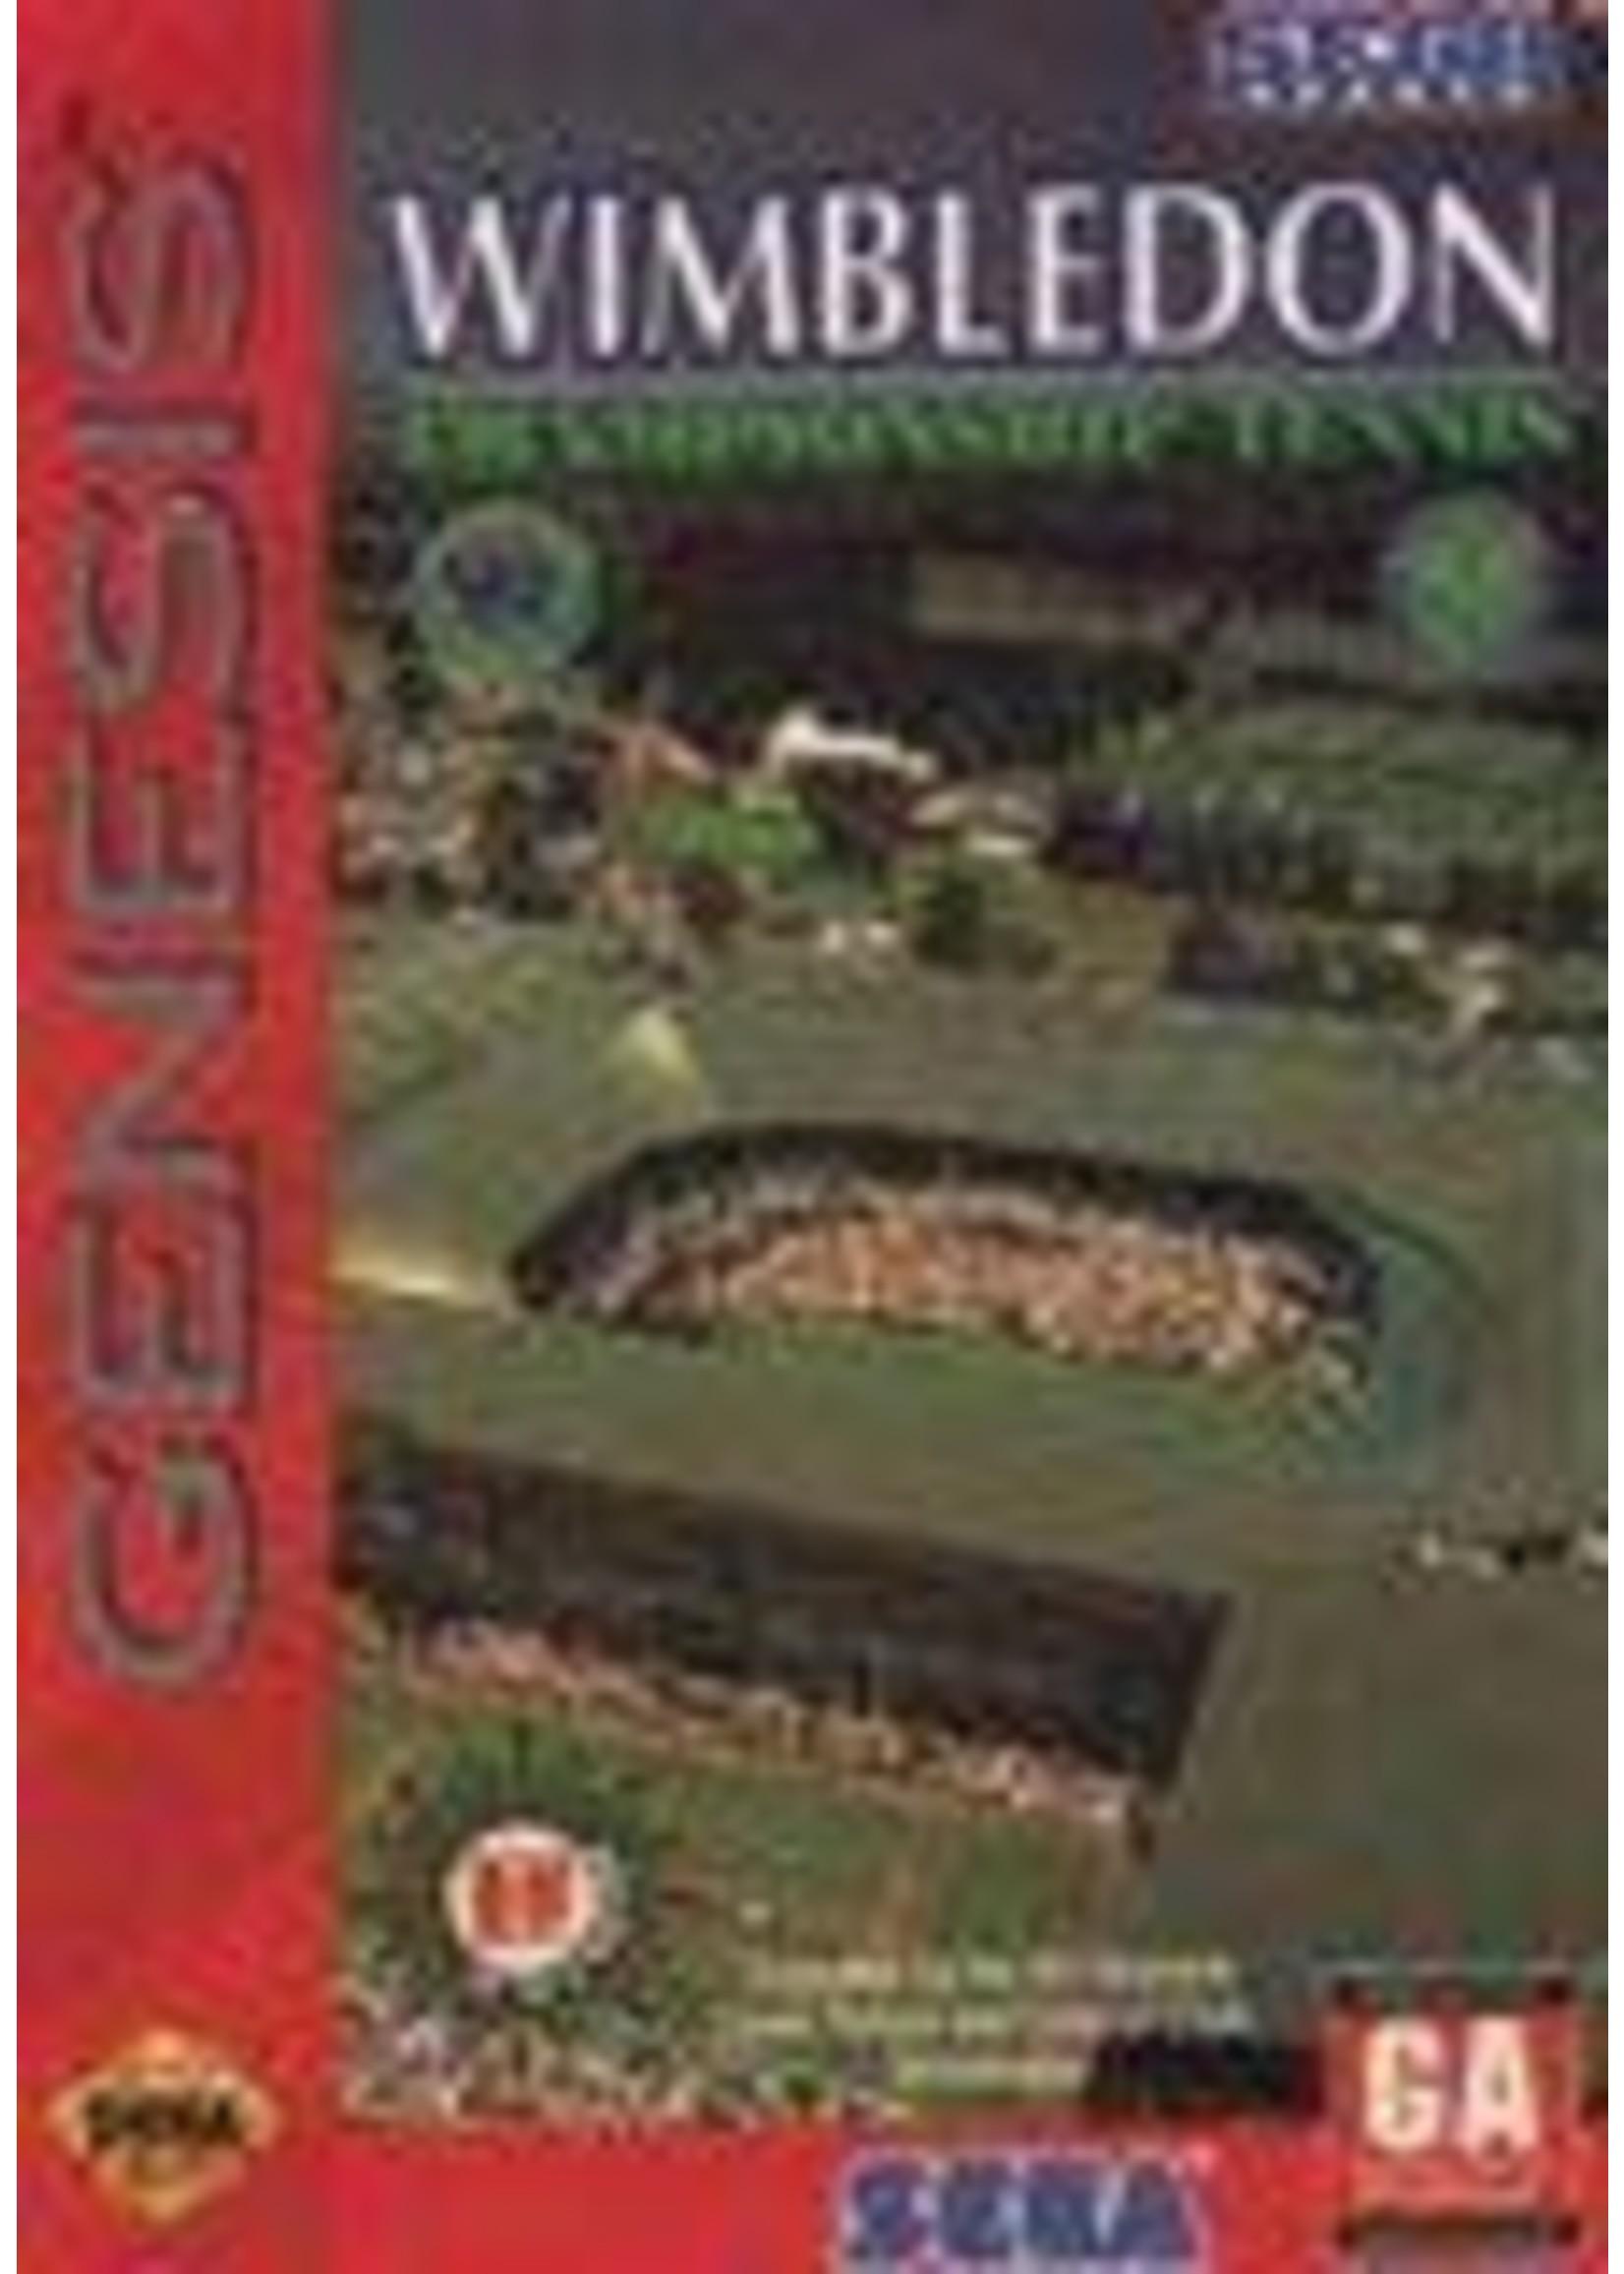 Wimbledon Championship Tennis Sega Genesis